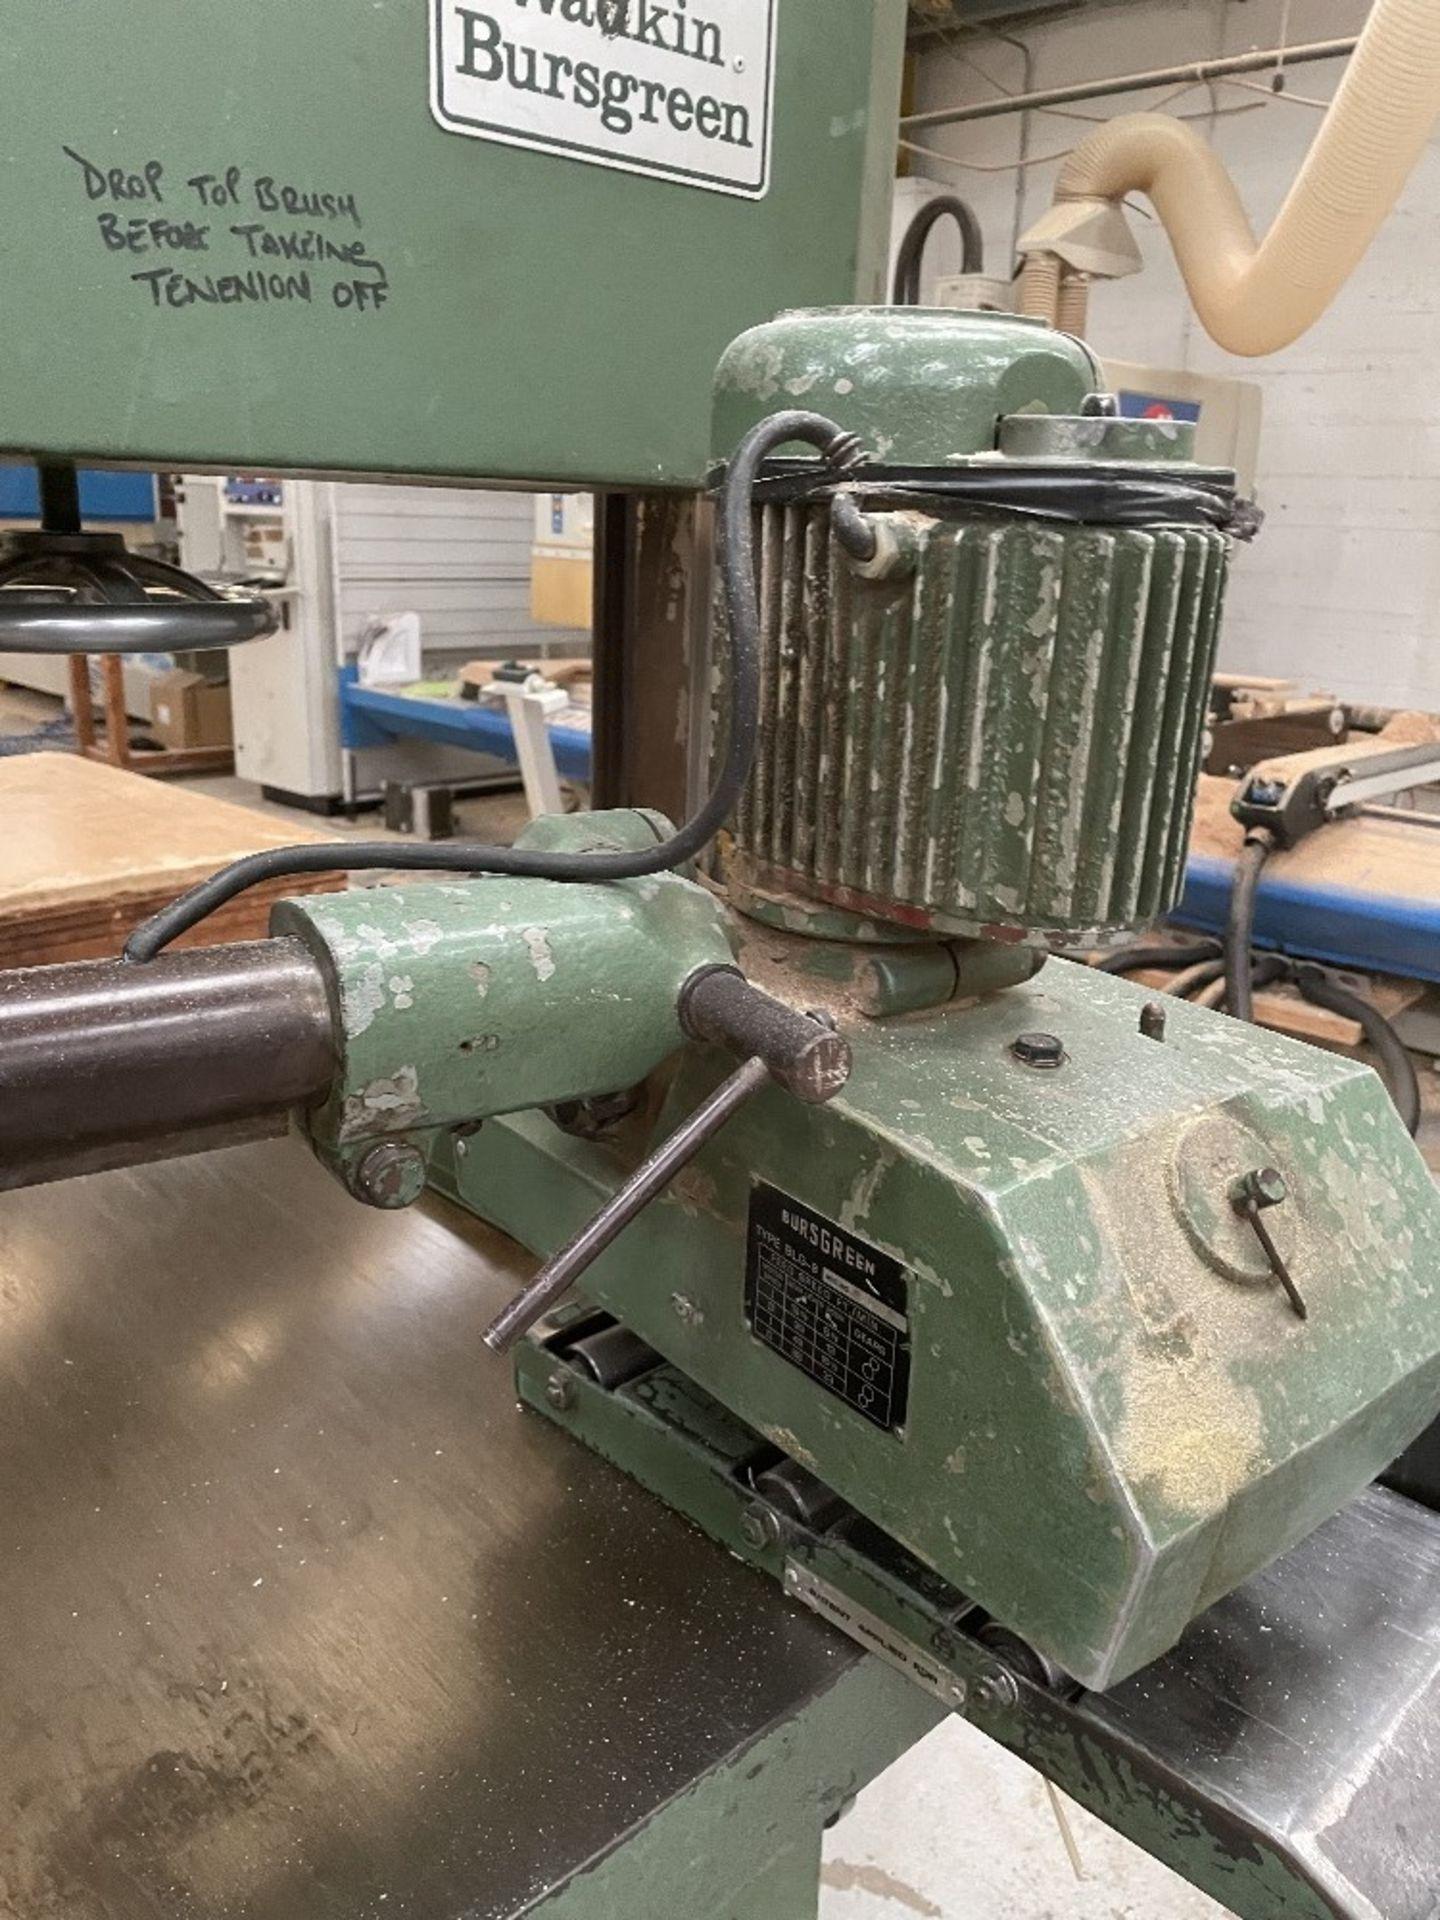 Wadkin Bursgreen Vertical Bandsaw w/ Power Feed - Image 7 of 9